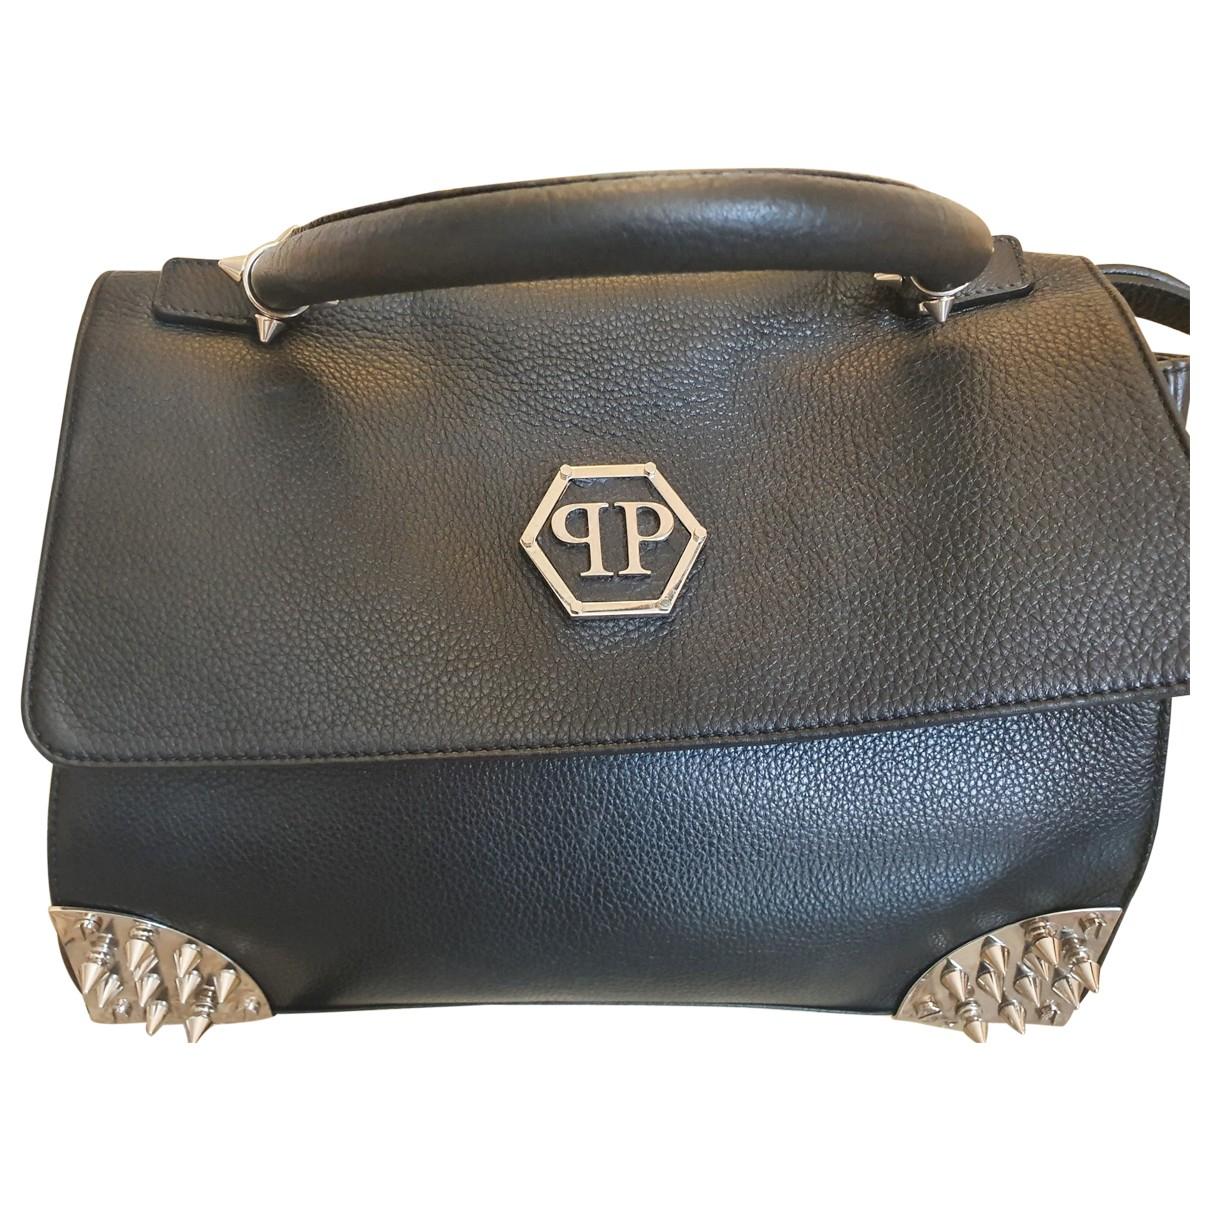 Philipp Plein \N Black Leather handbag for Women \N